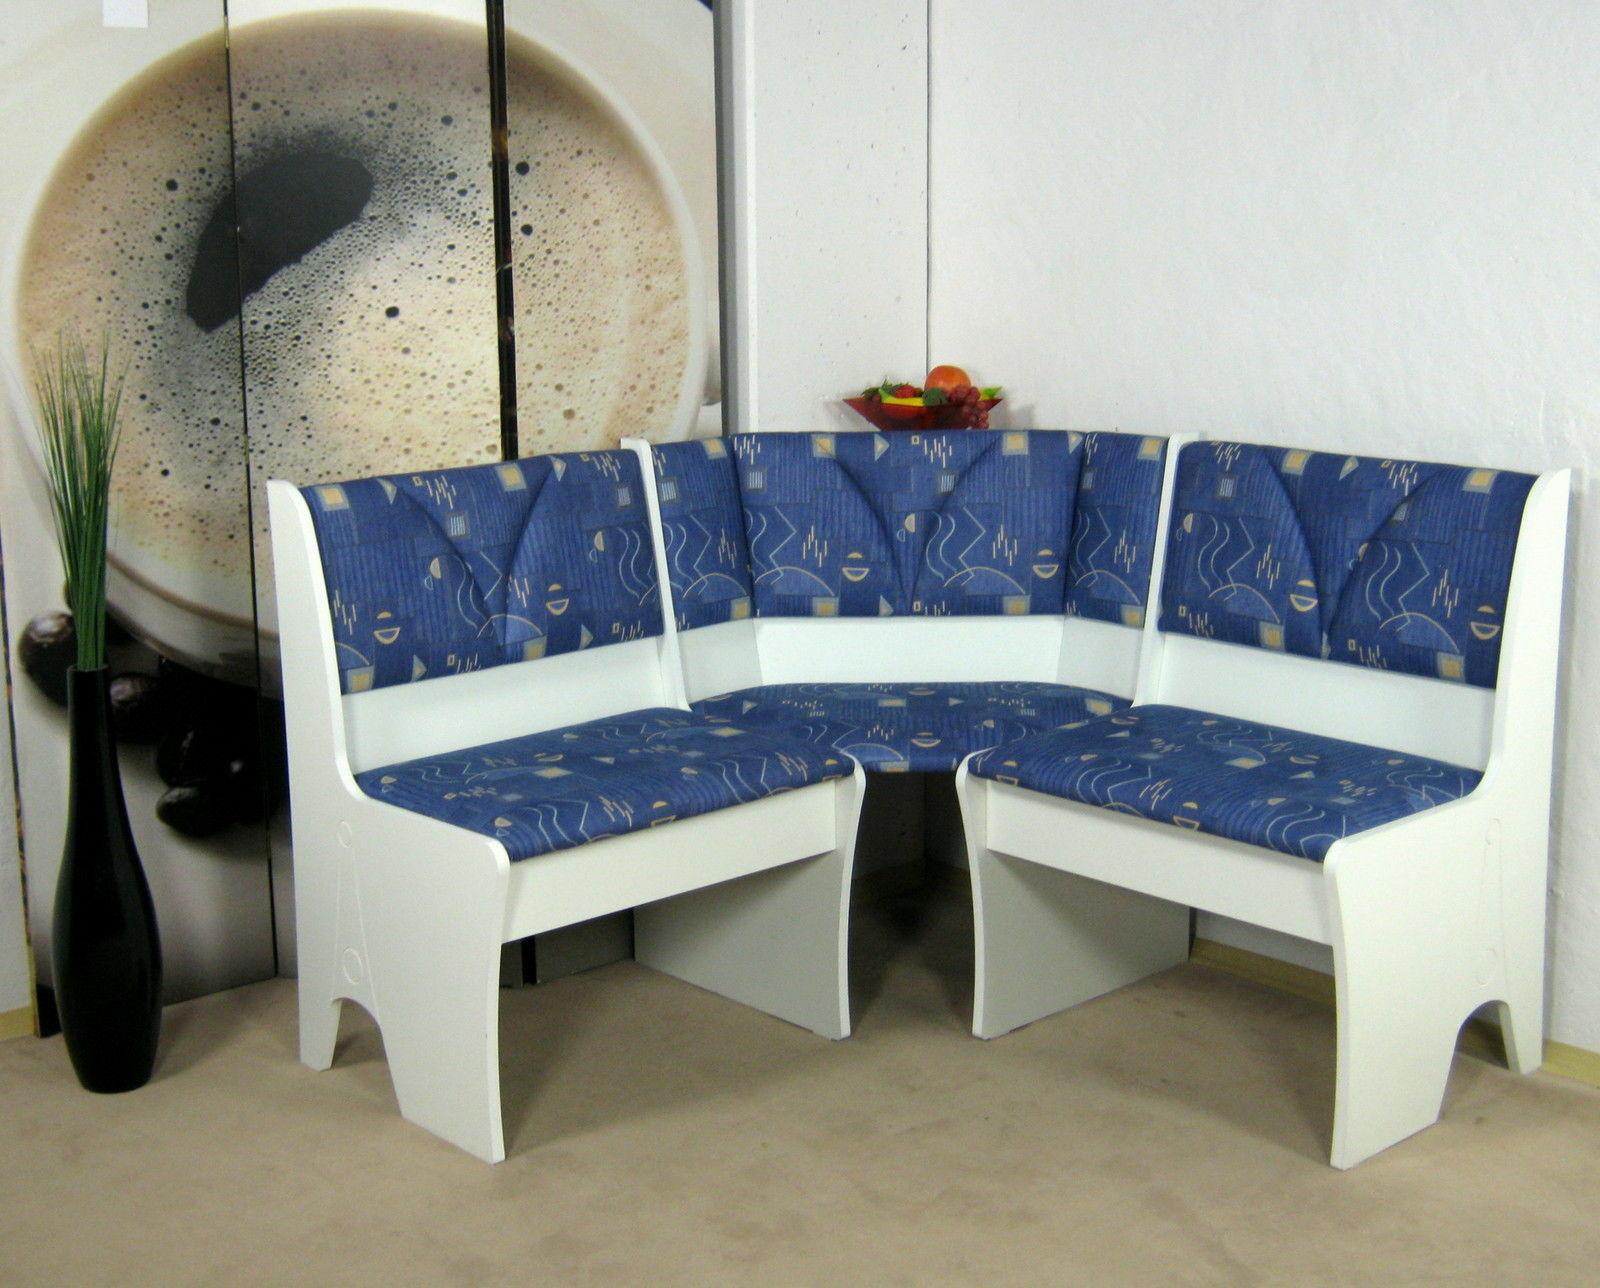 truheneckbank weis, truheneckbank weiß blau eckbank esszimmerbank truhenbank sitzbank, Design ideen